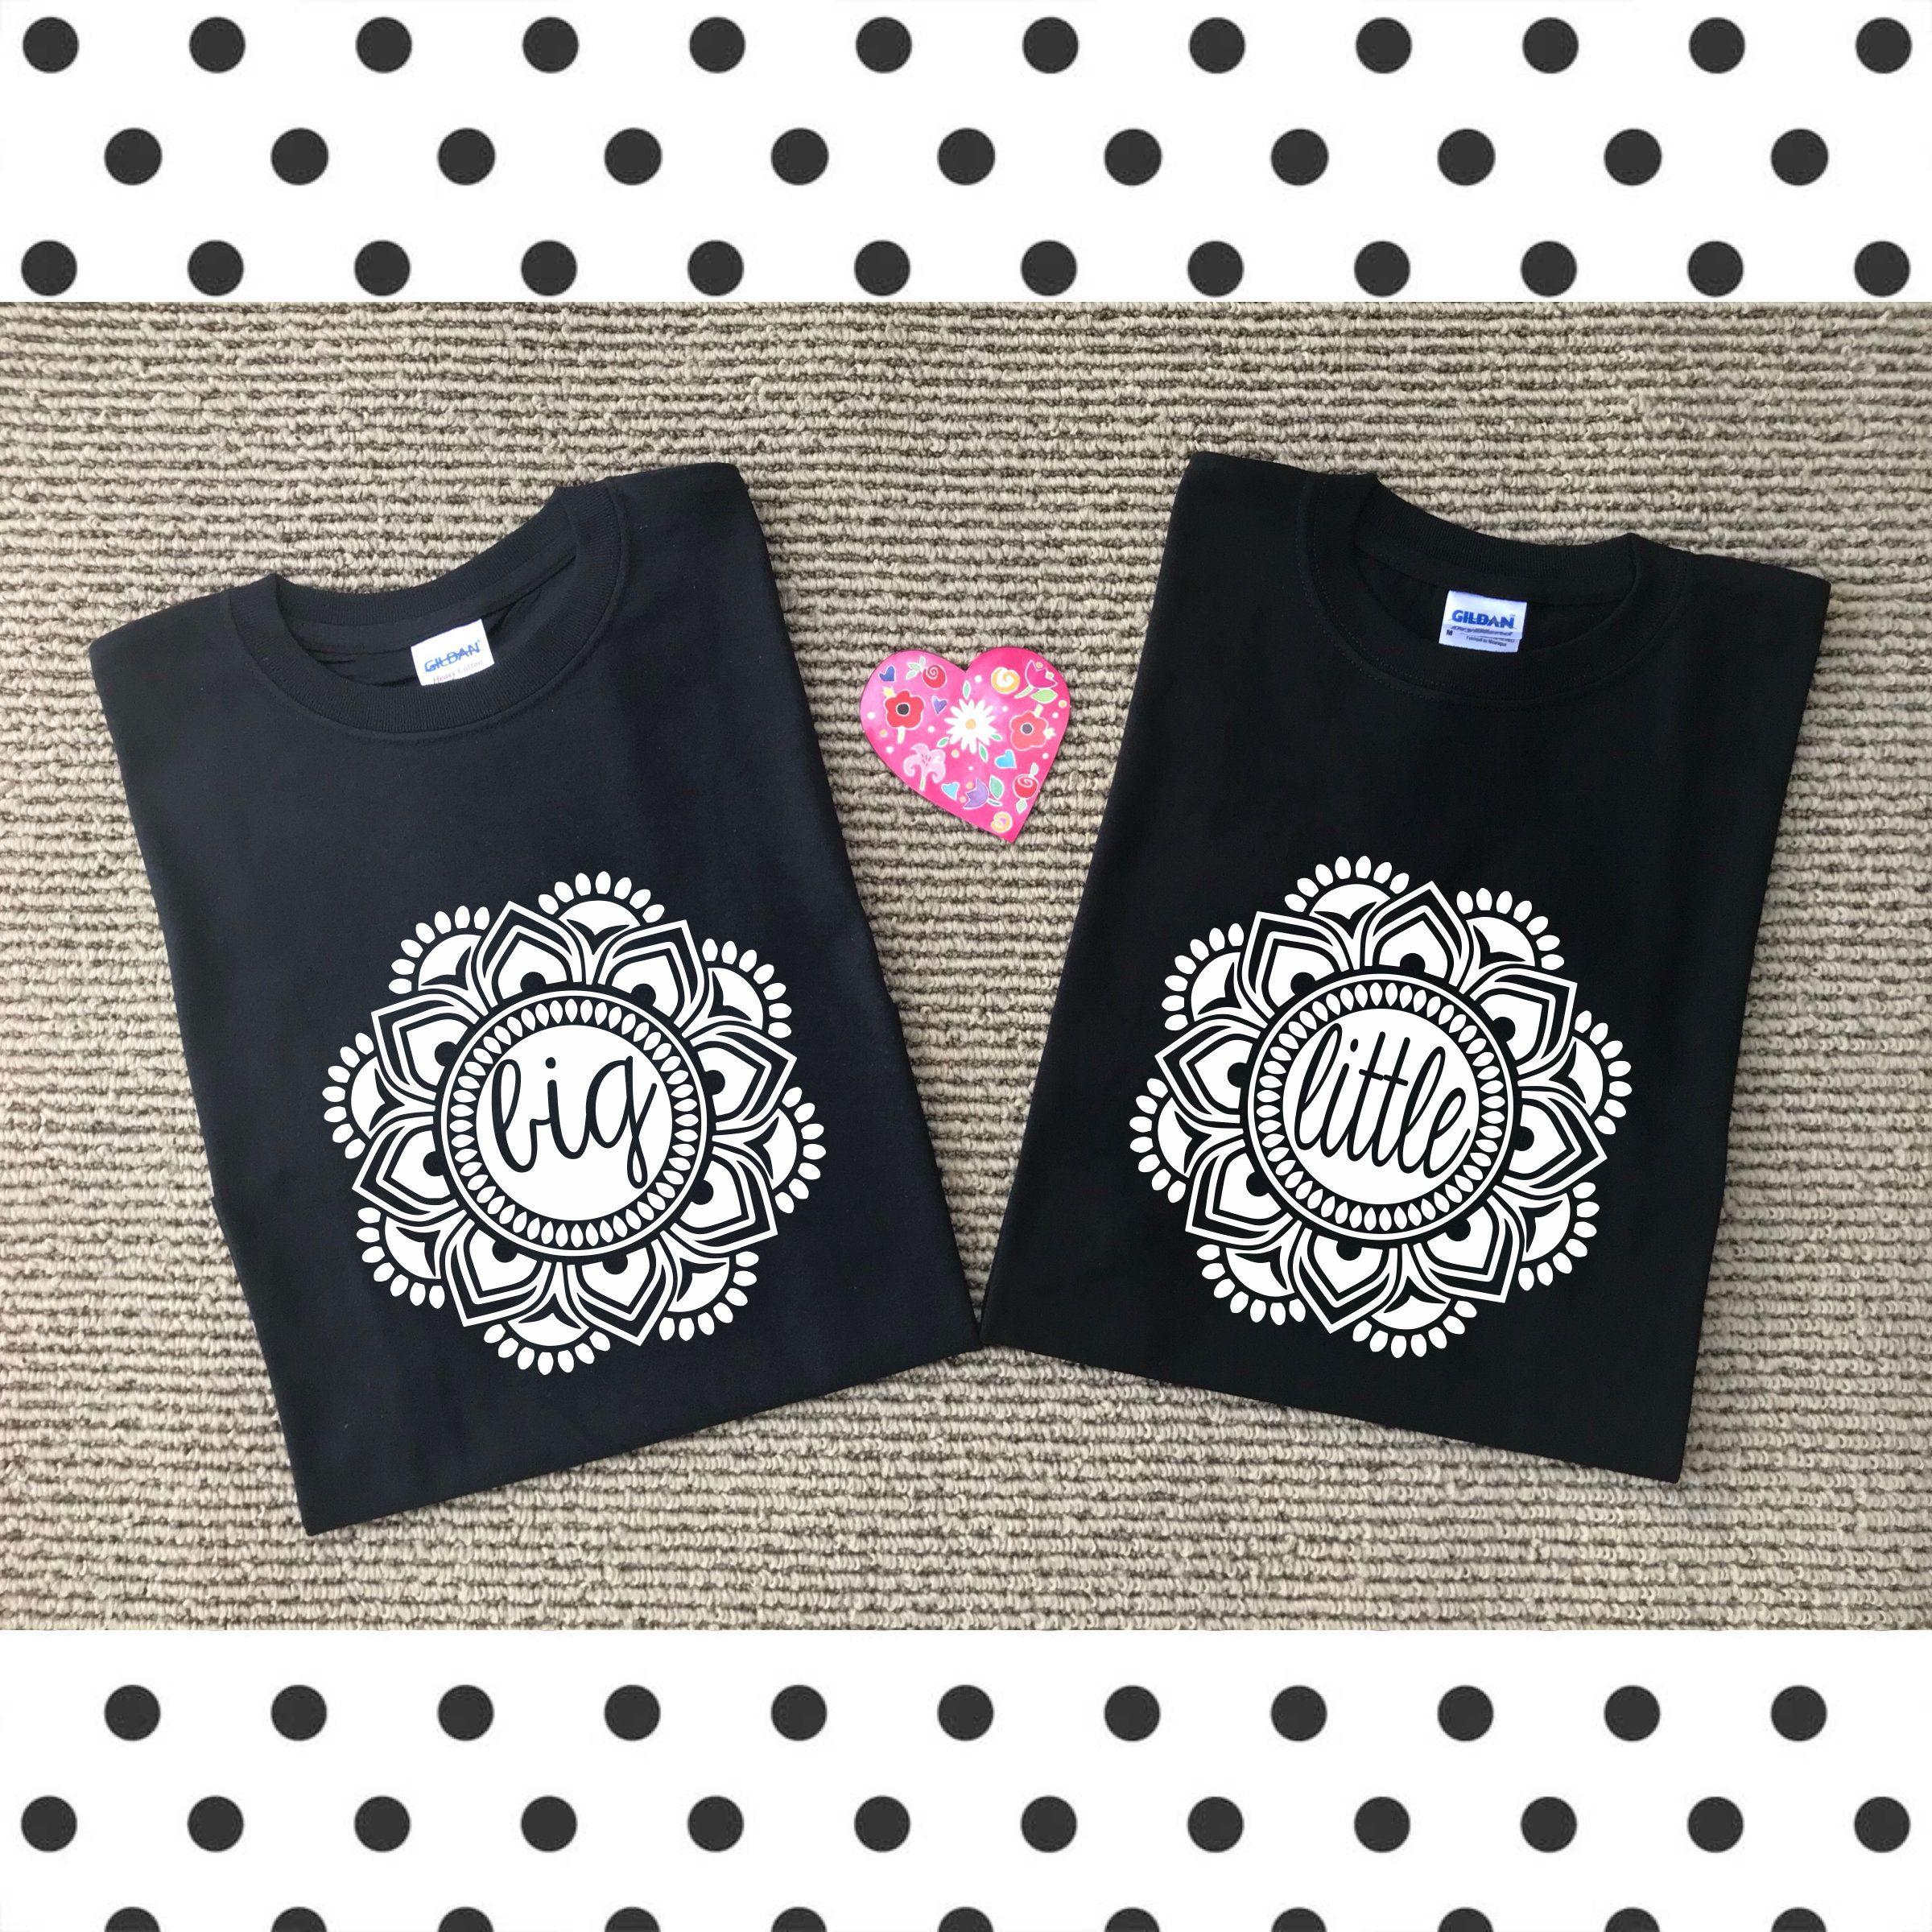 Big Little shirts || Big Little Reveal || Mandala || Sorority Sisters || Greek Life || Sorority Family || Cheer Sisters #biglittlereveal